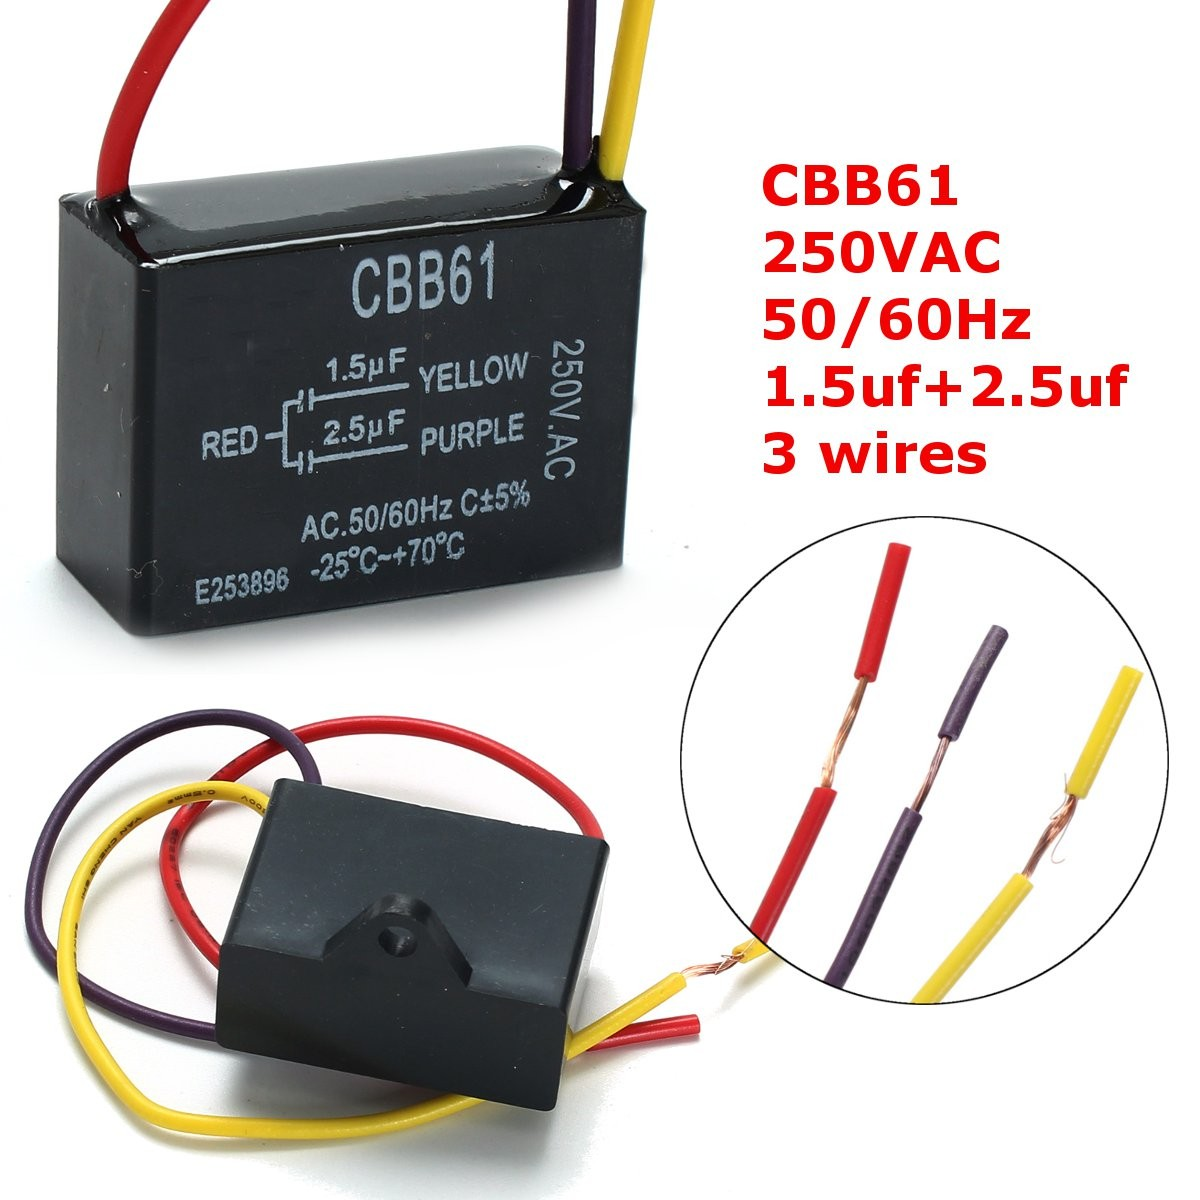 1pc Black Fan Capacitor CBB61 1.5uF+2.5uF 3 Wires AC 250V 50/60Hz ...